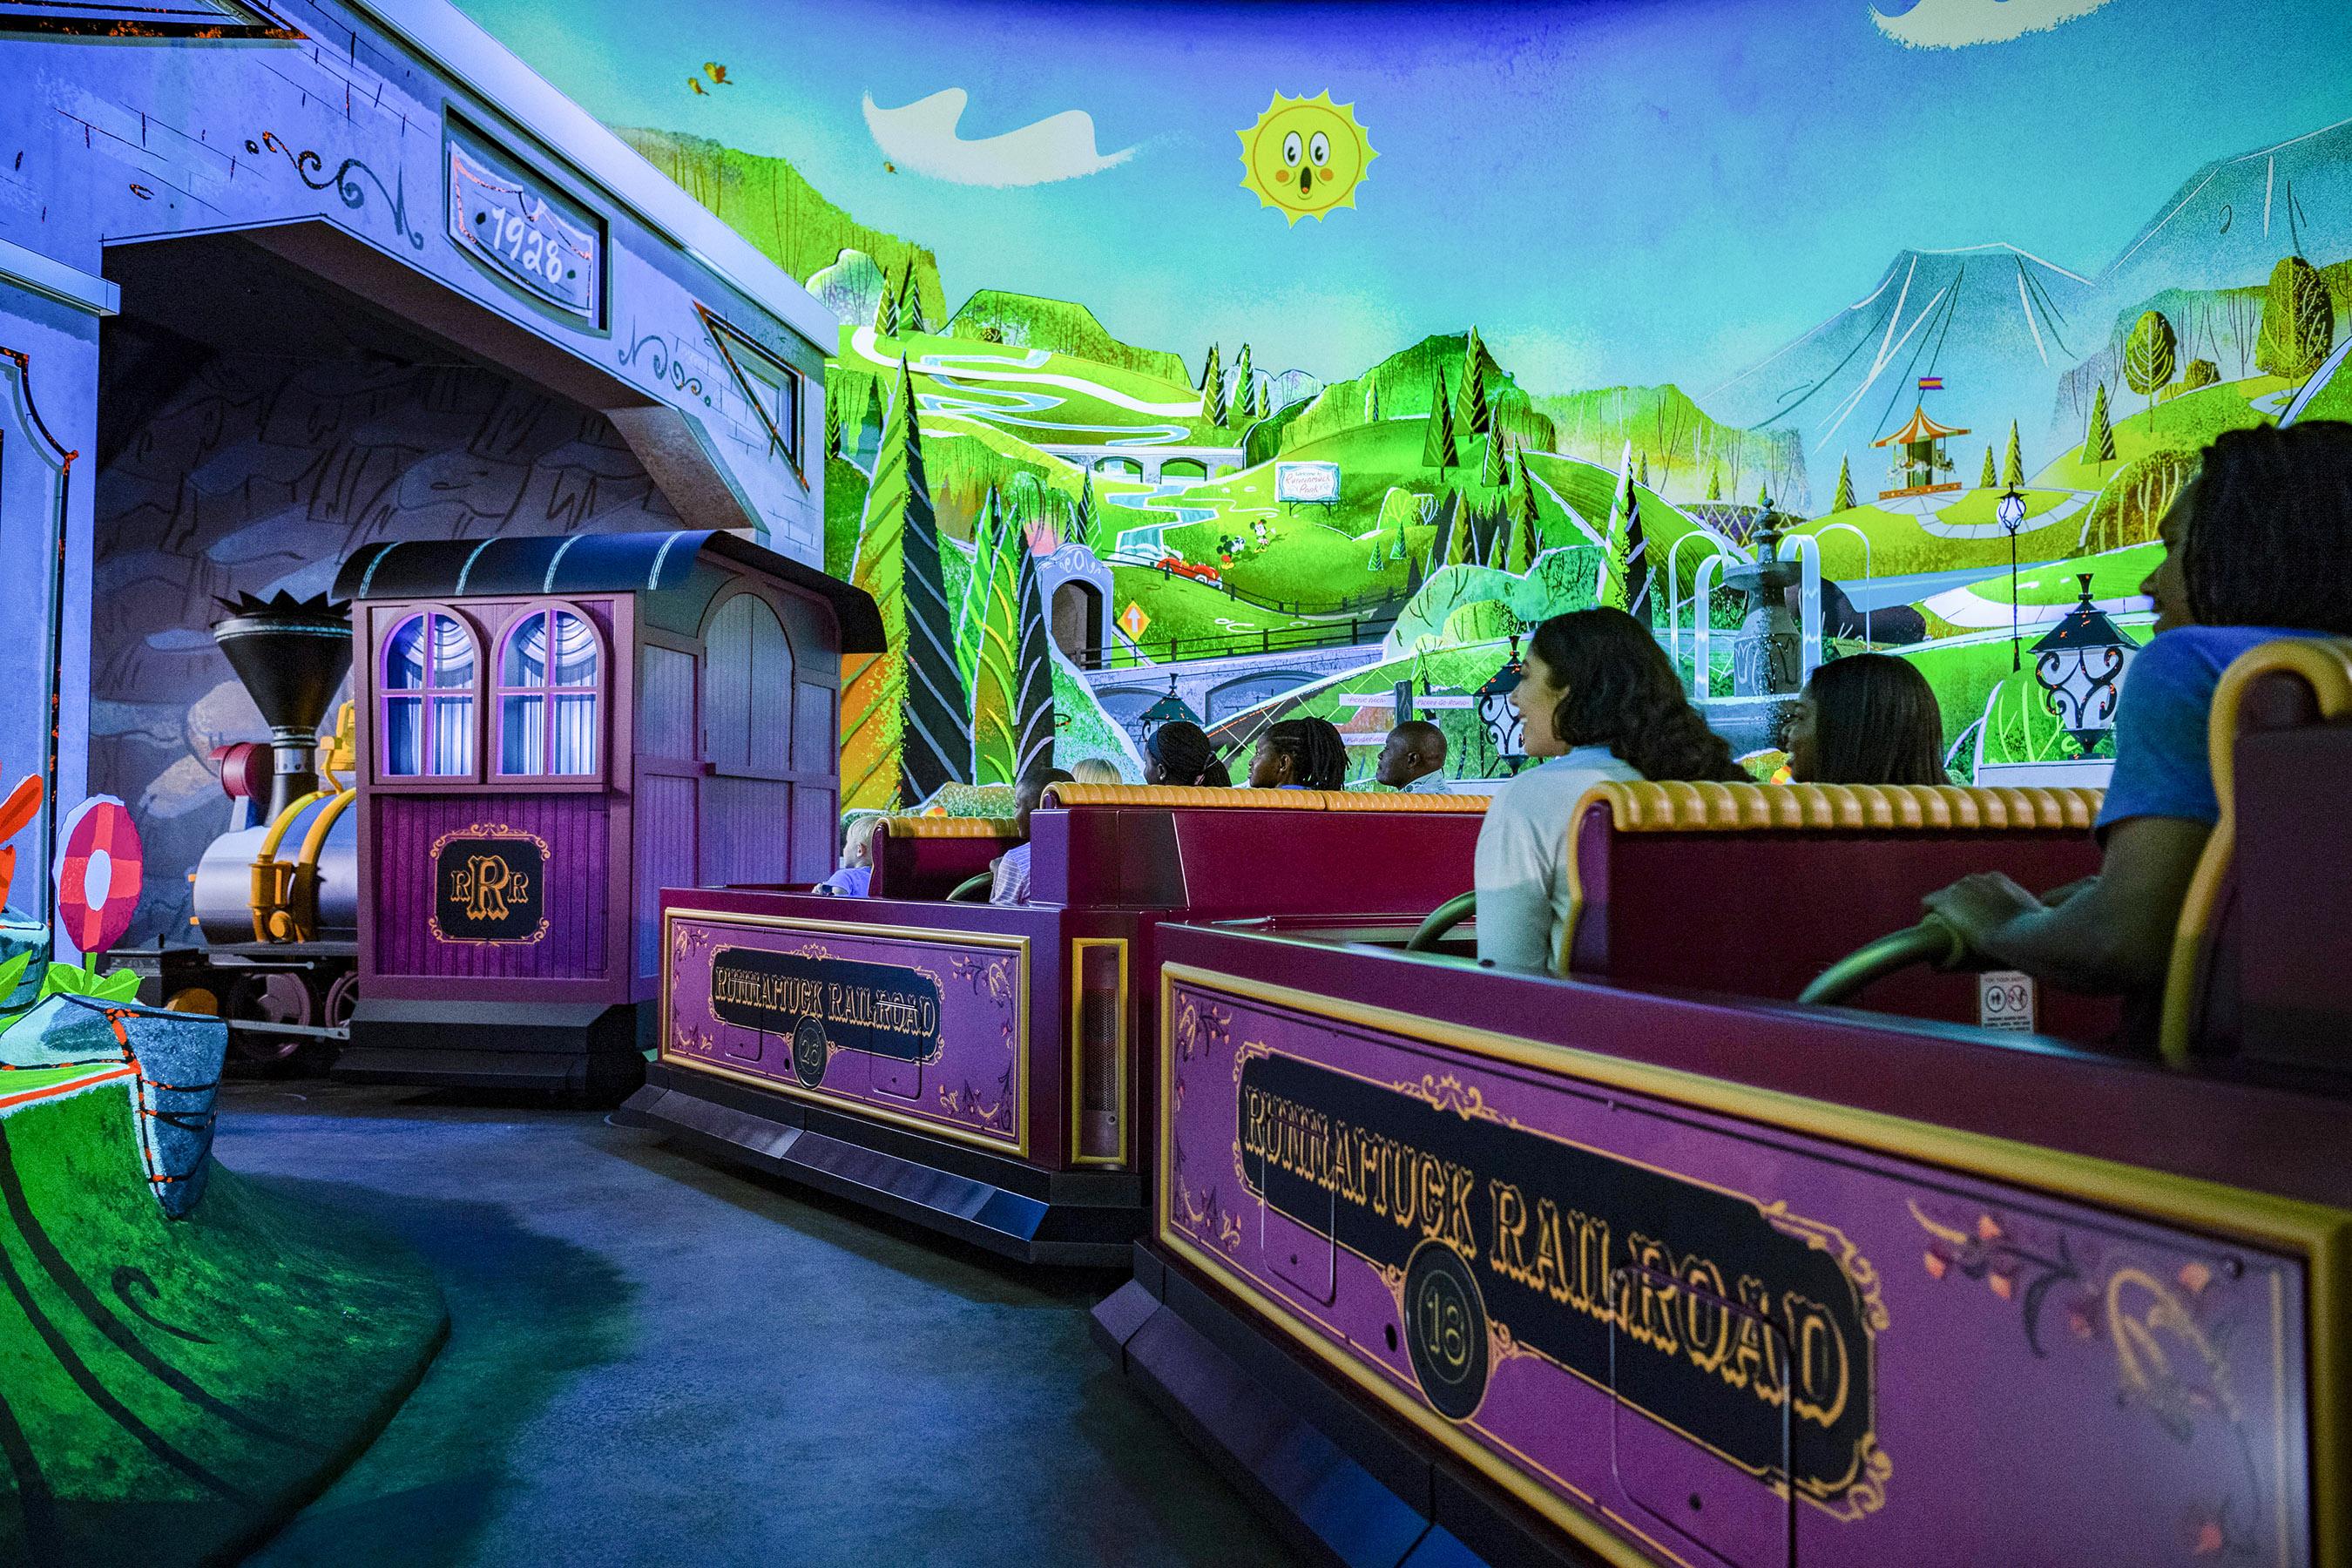 Review: Mickey and Minnie's Runaway Railway